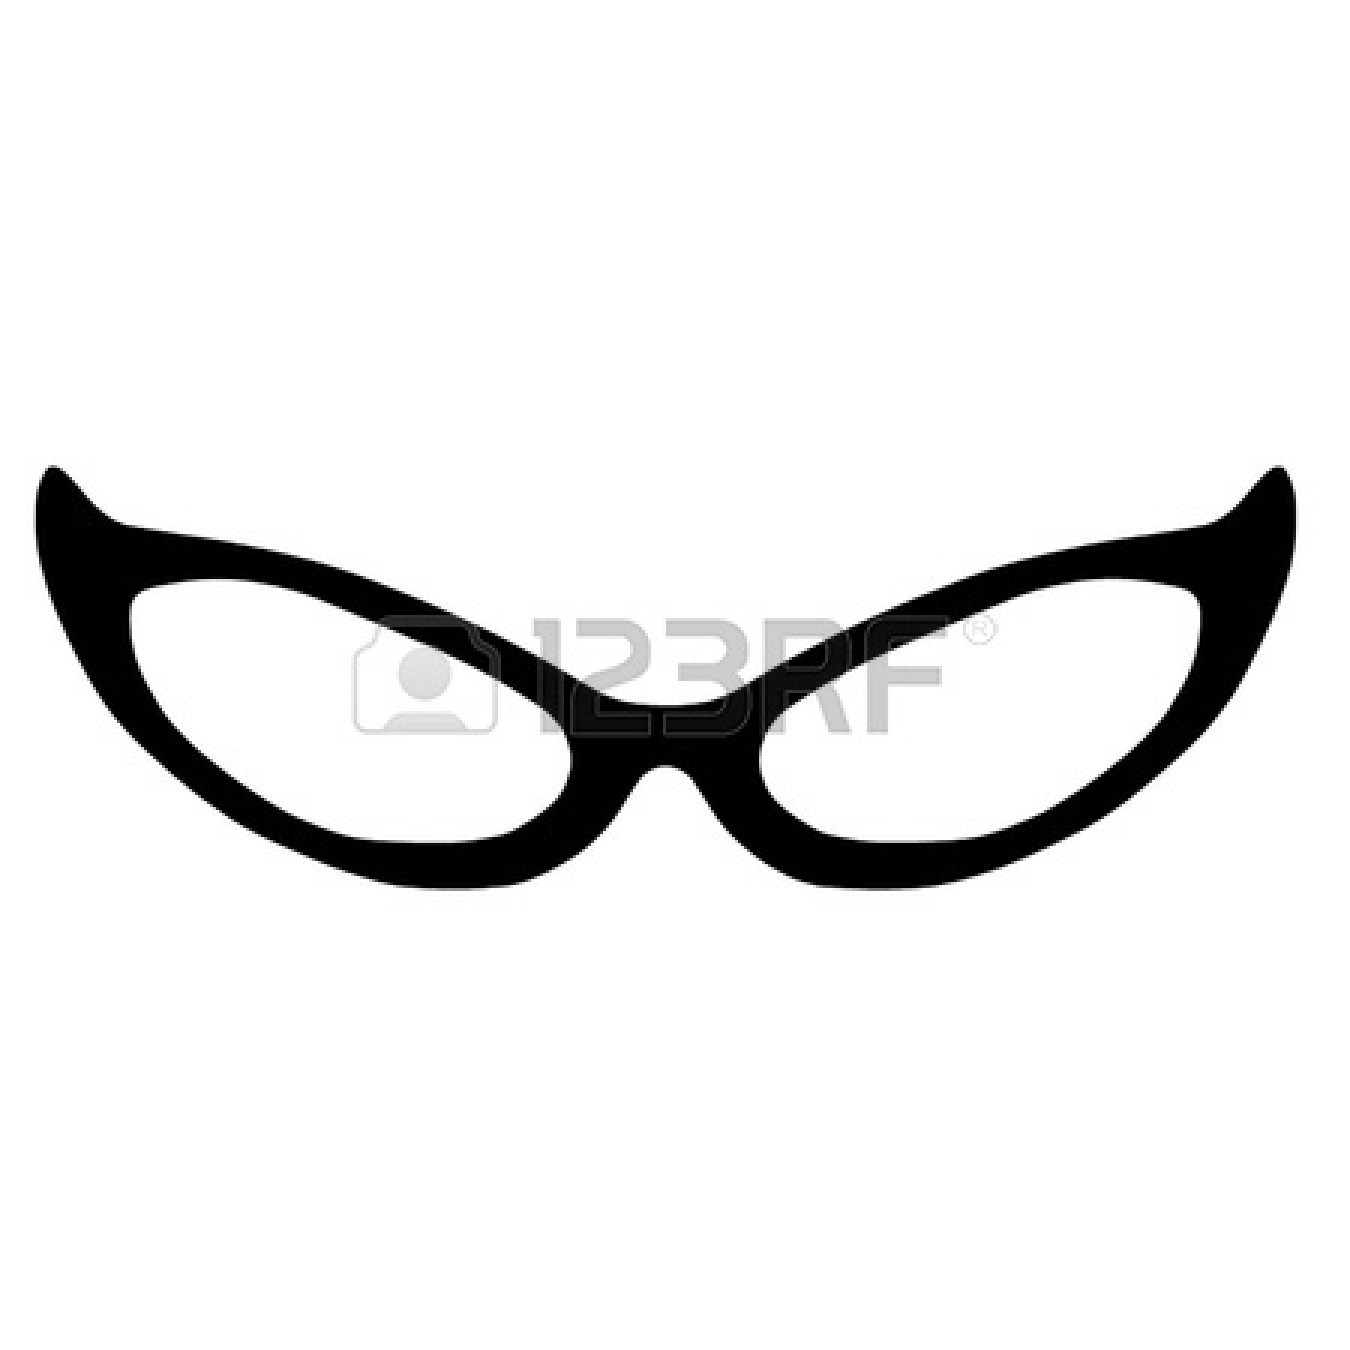 Nerd Glasses Sketch.